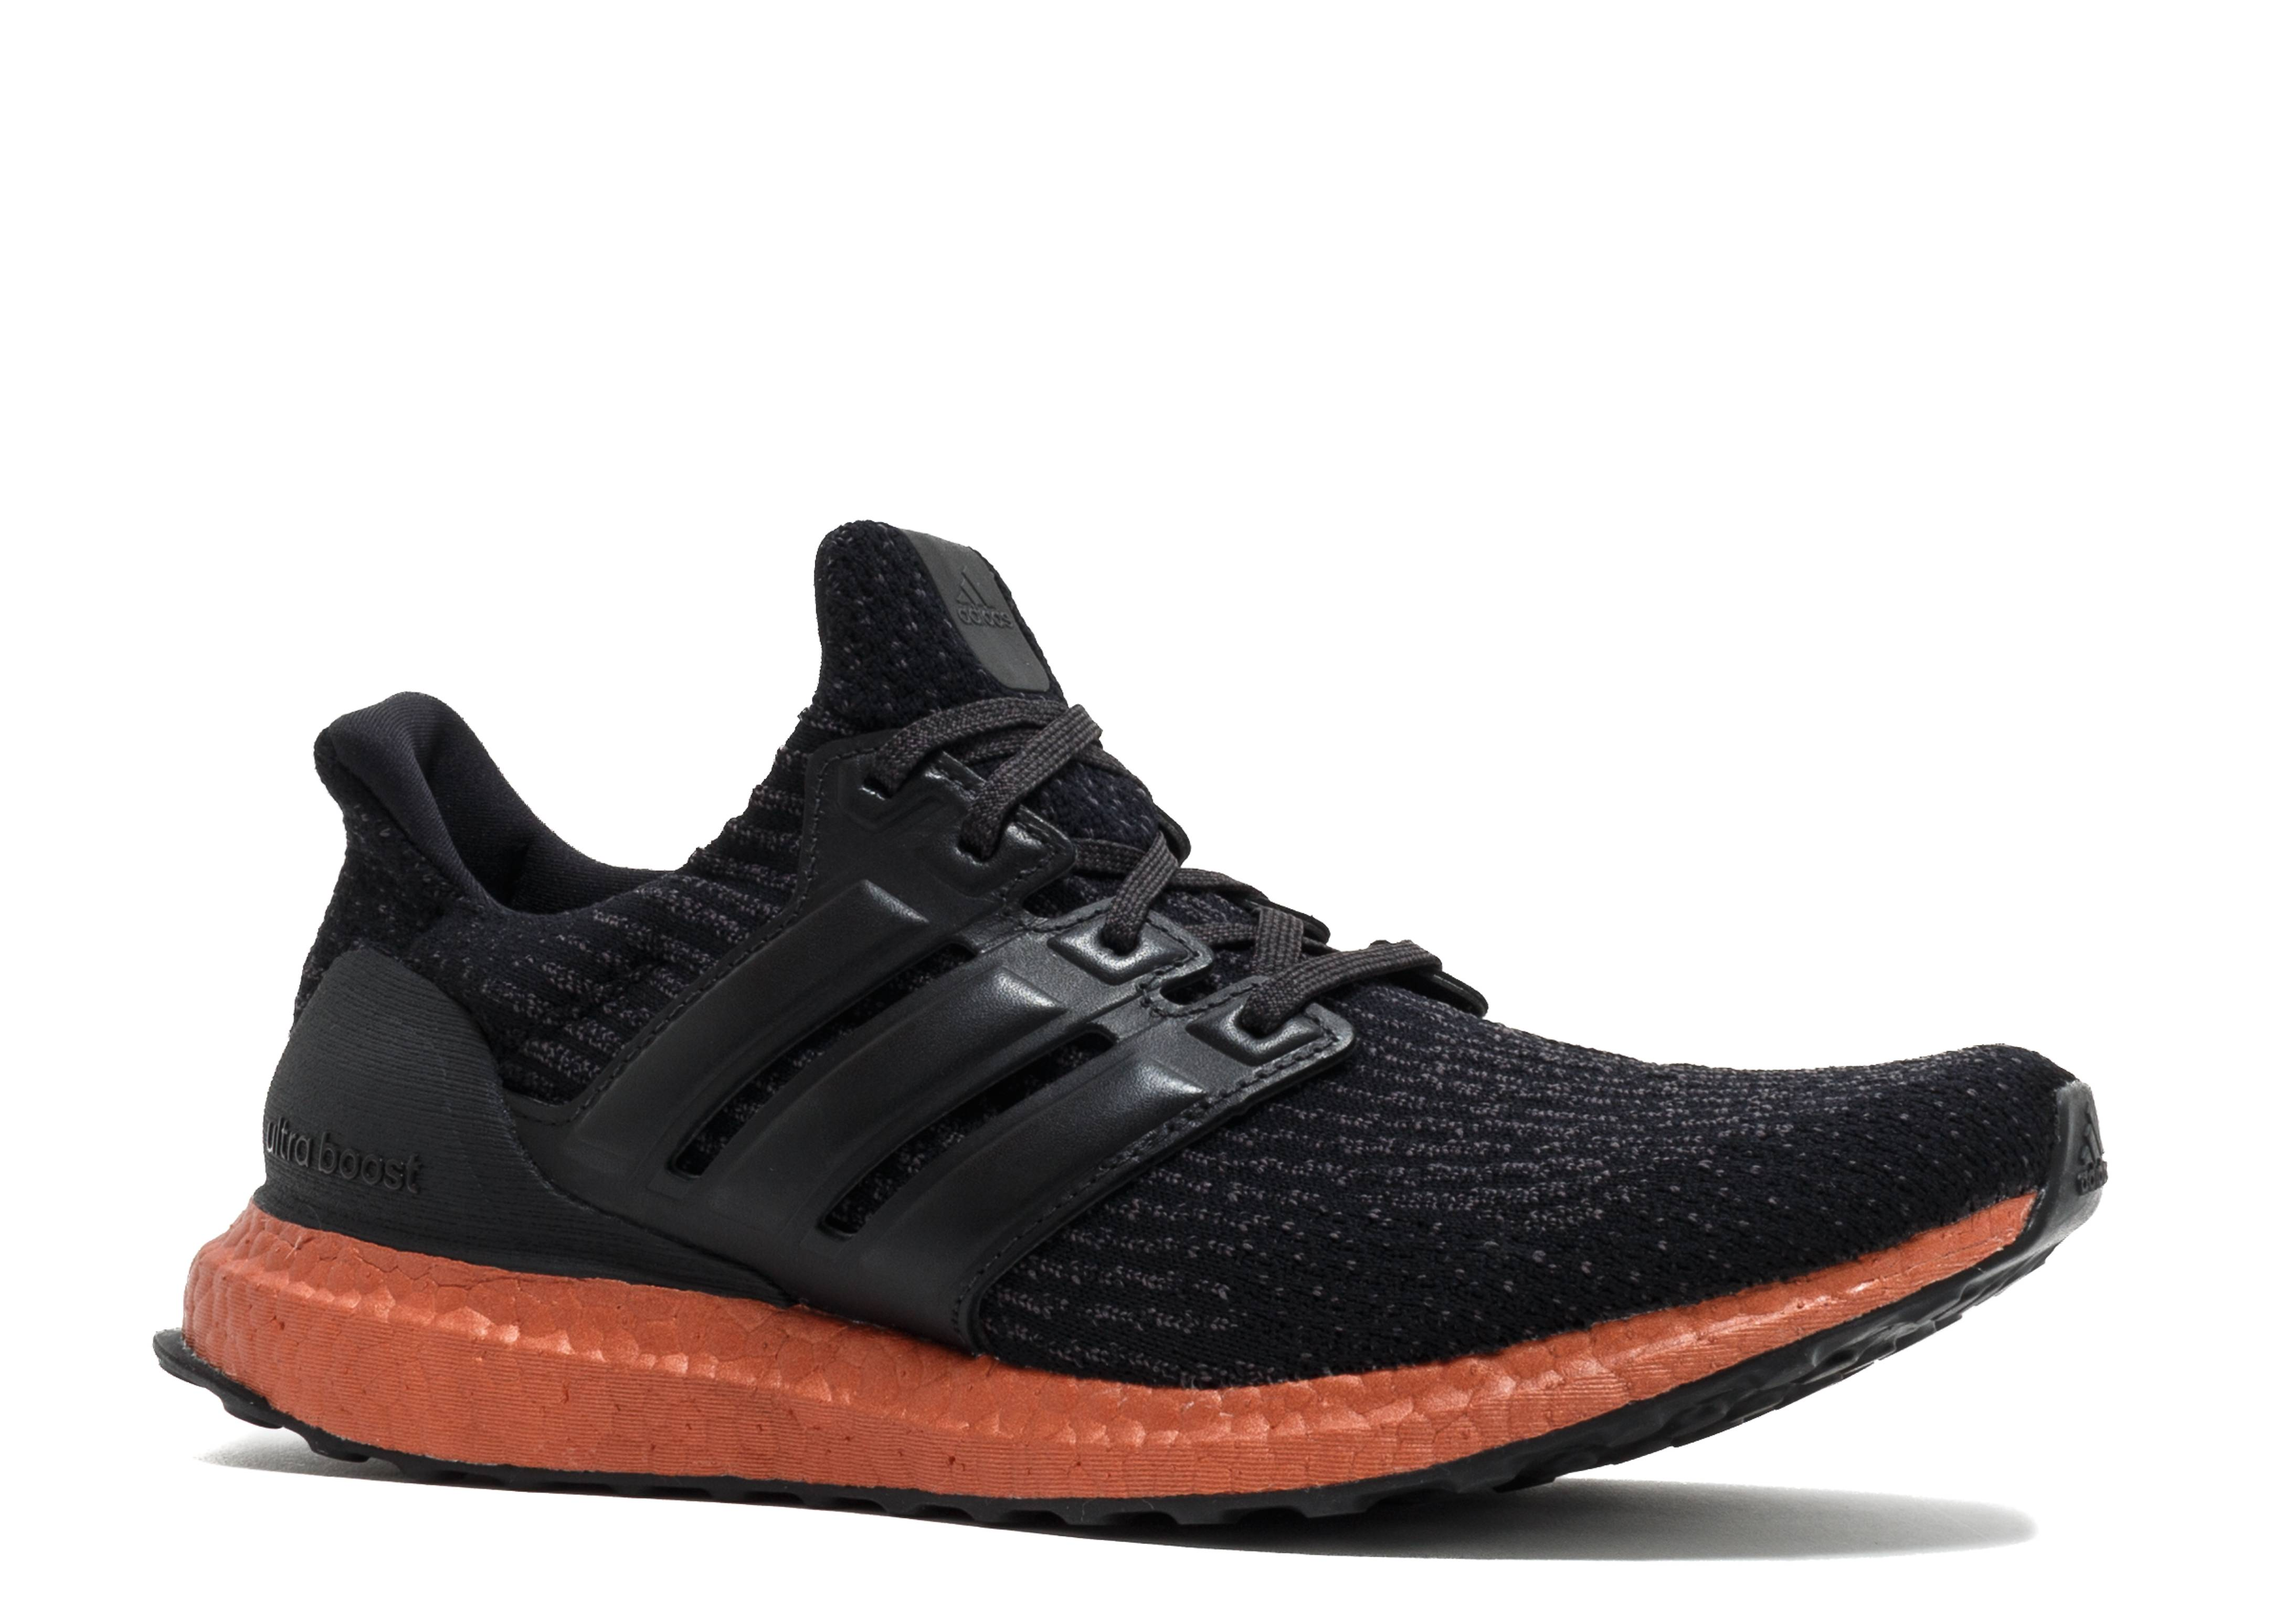 2cd36fe8684 Ultra Boost - Adidas - cg4086 - black bronze